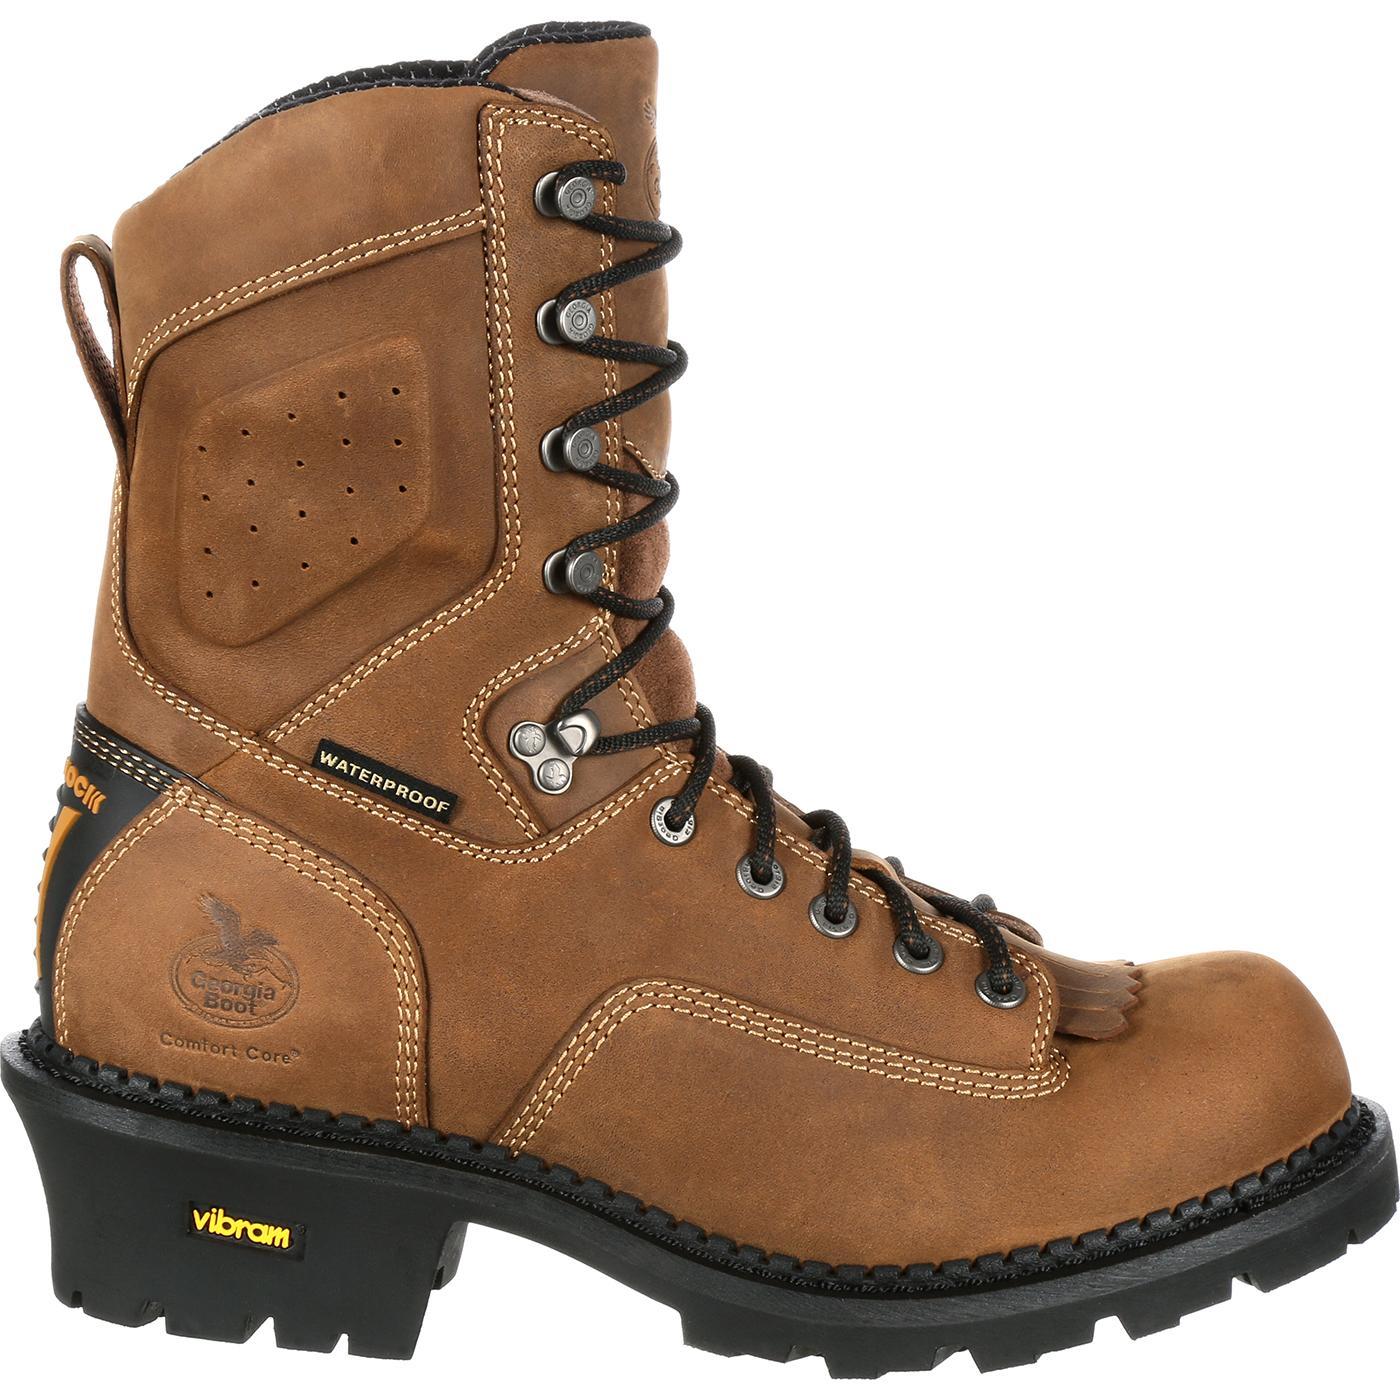 0b173e607c7 Georgia Boot Comfort Core Logger Composite Toe Waterproof Work Boot